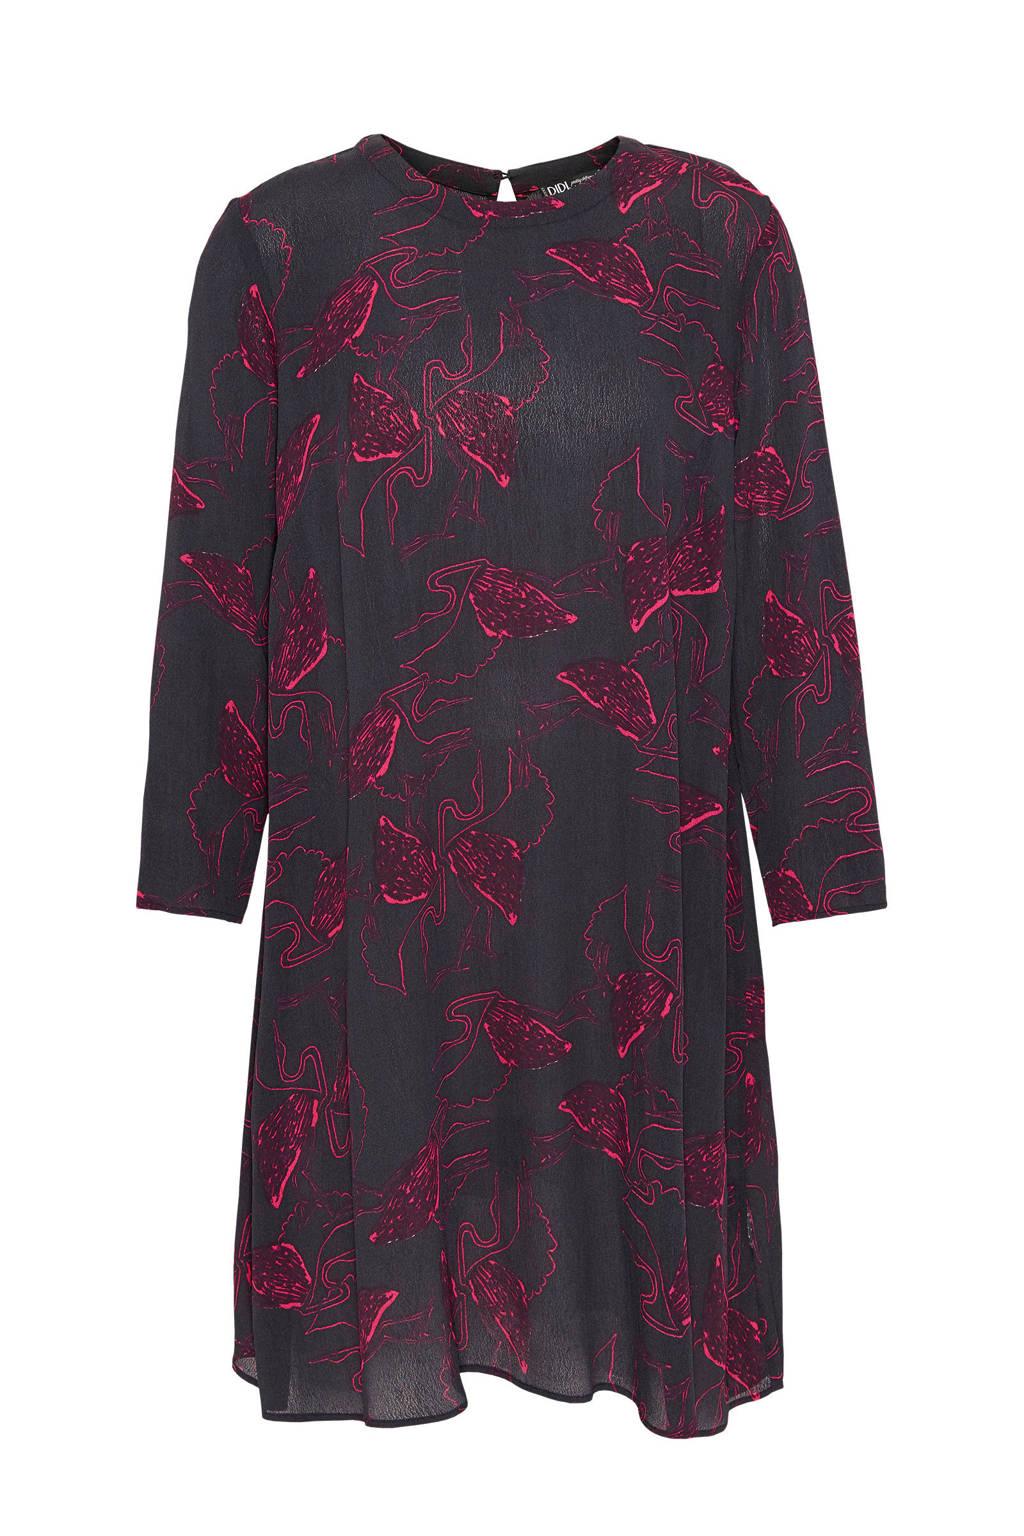 Didi jurk met flamingo print, Antraciet